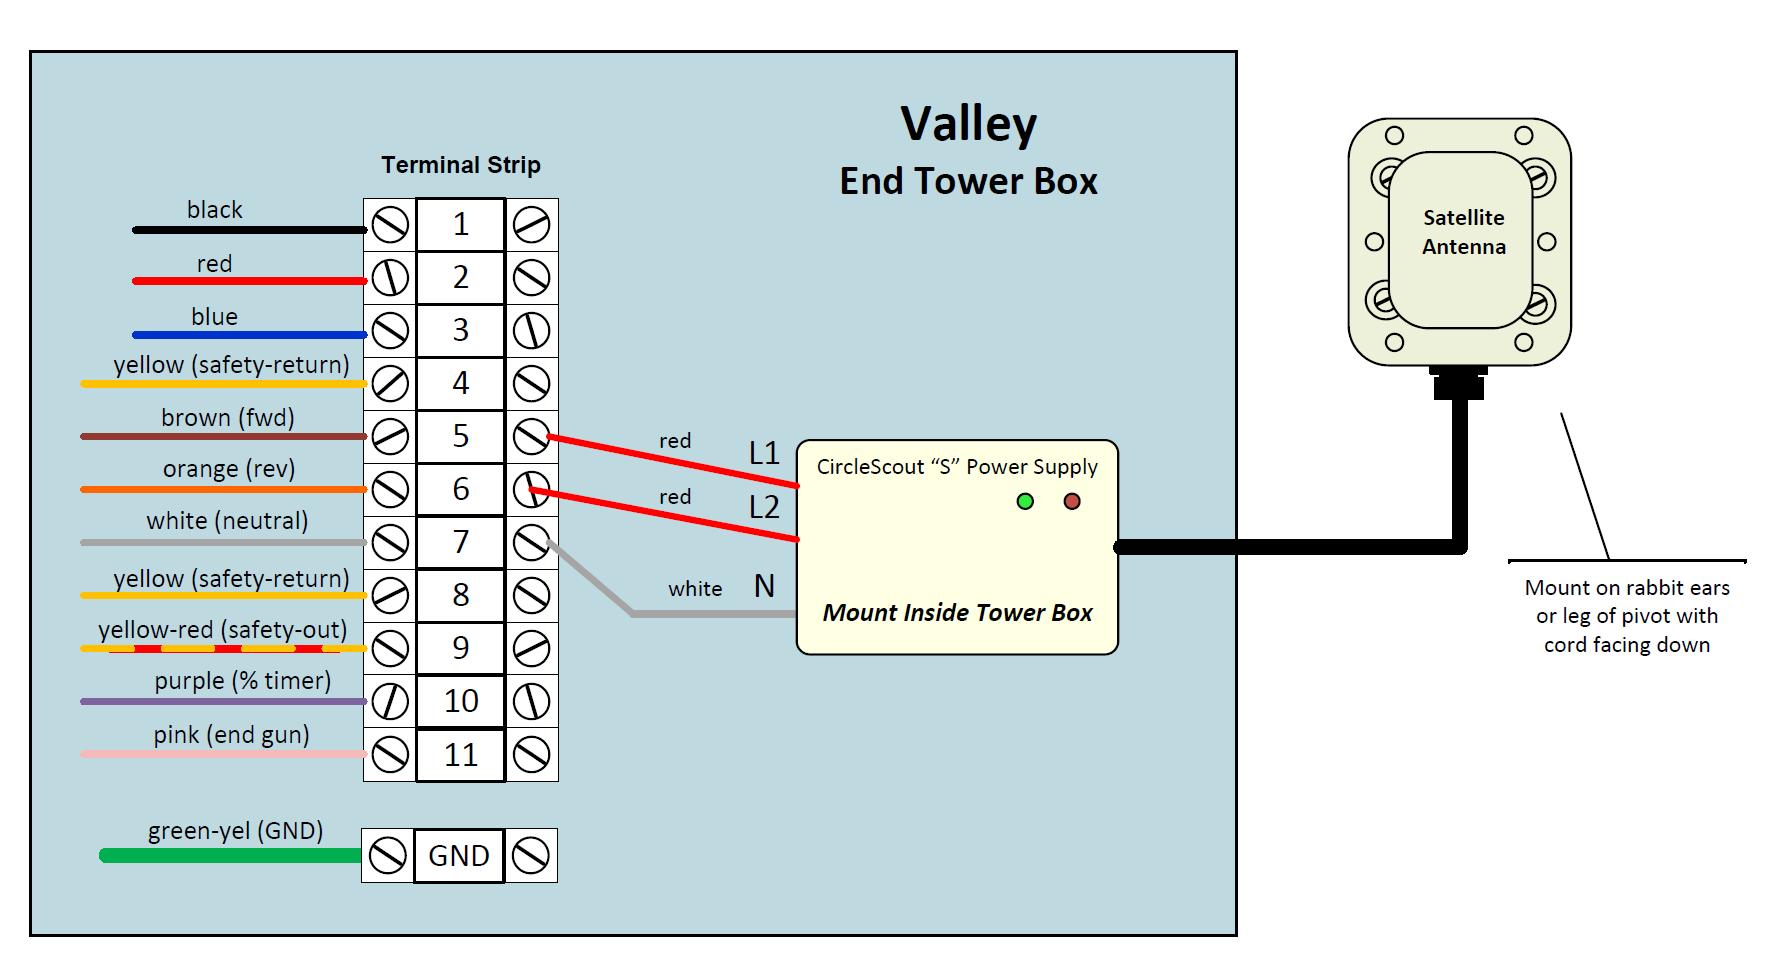 valley wiring for circlescout s 2018 satellite version net rh help netirrigate com Residential Electrical Wiring Diagrams Simple Wiring Diagrams